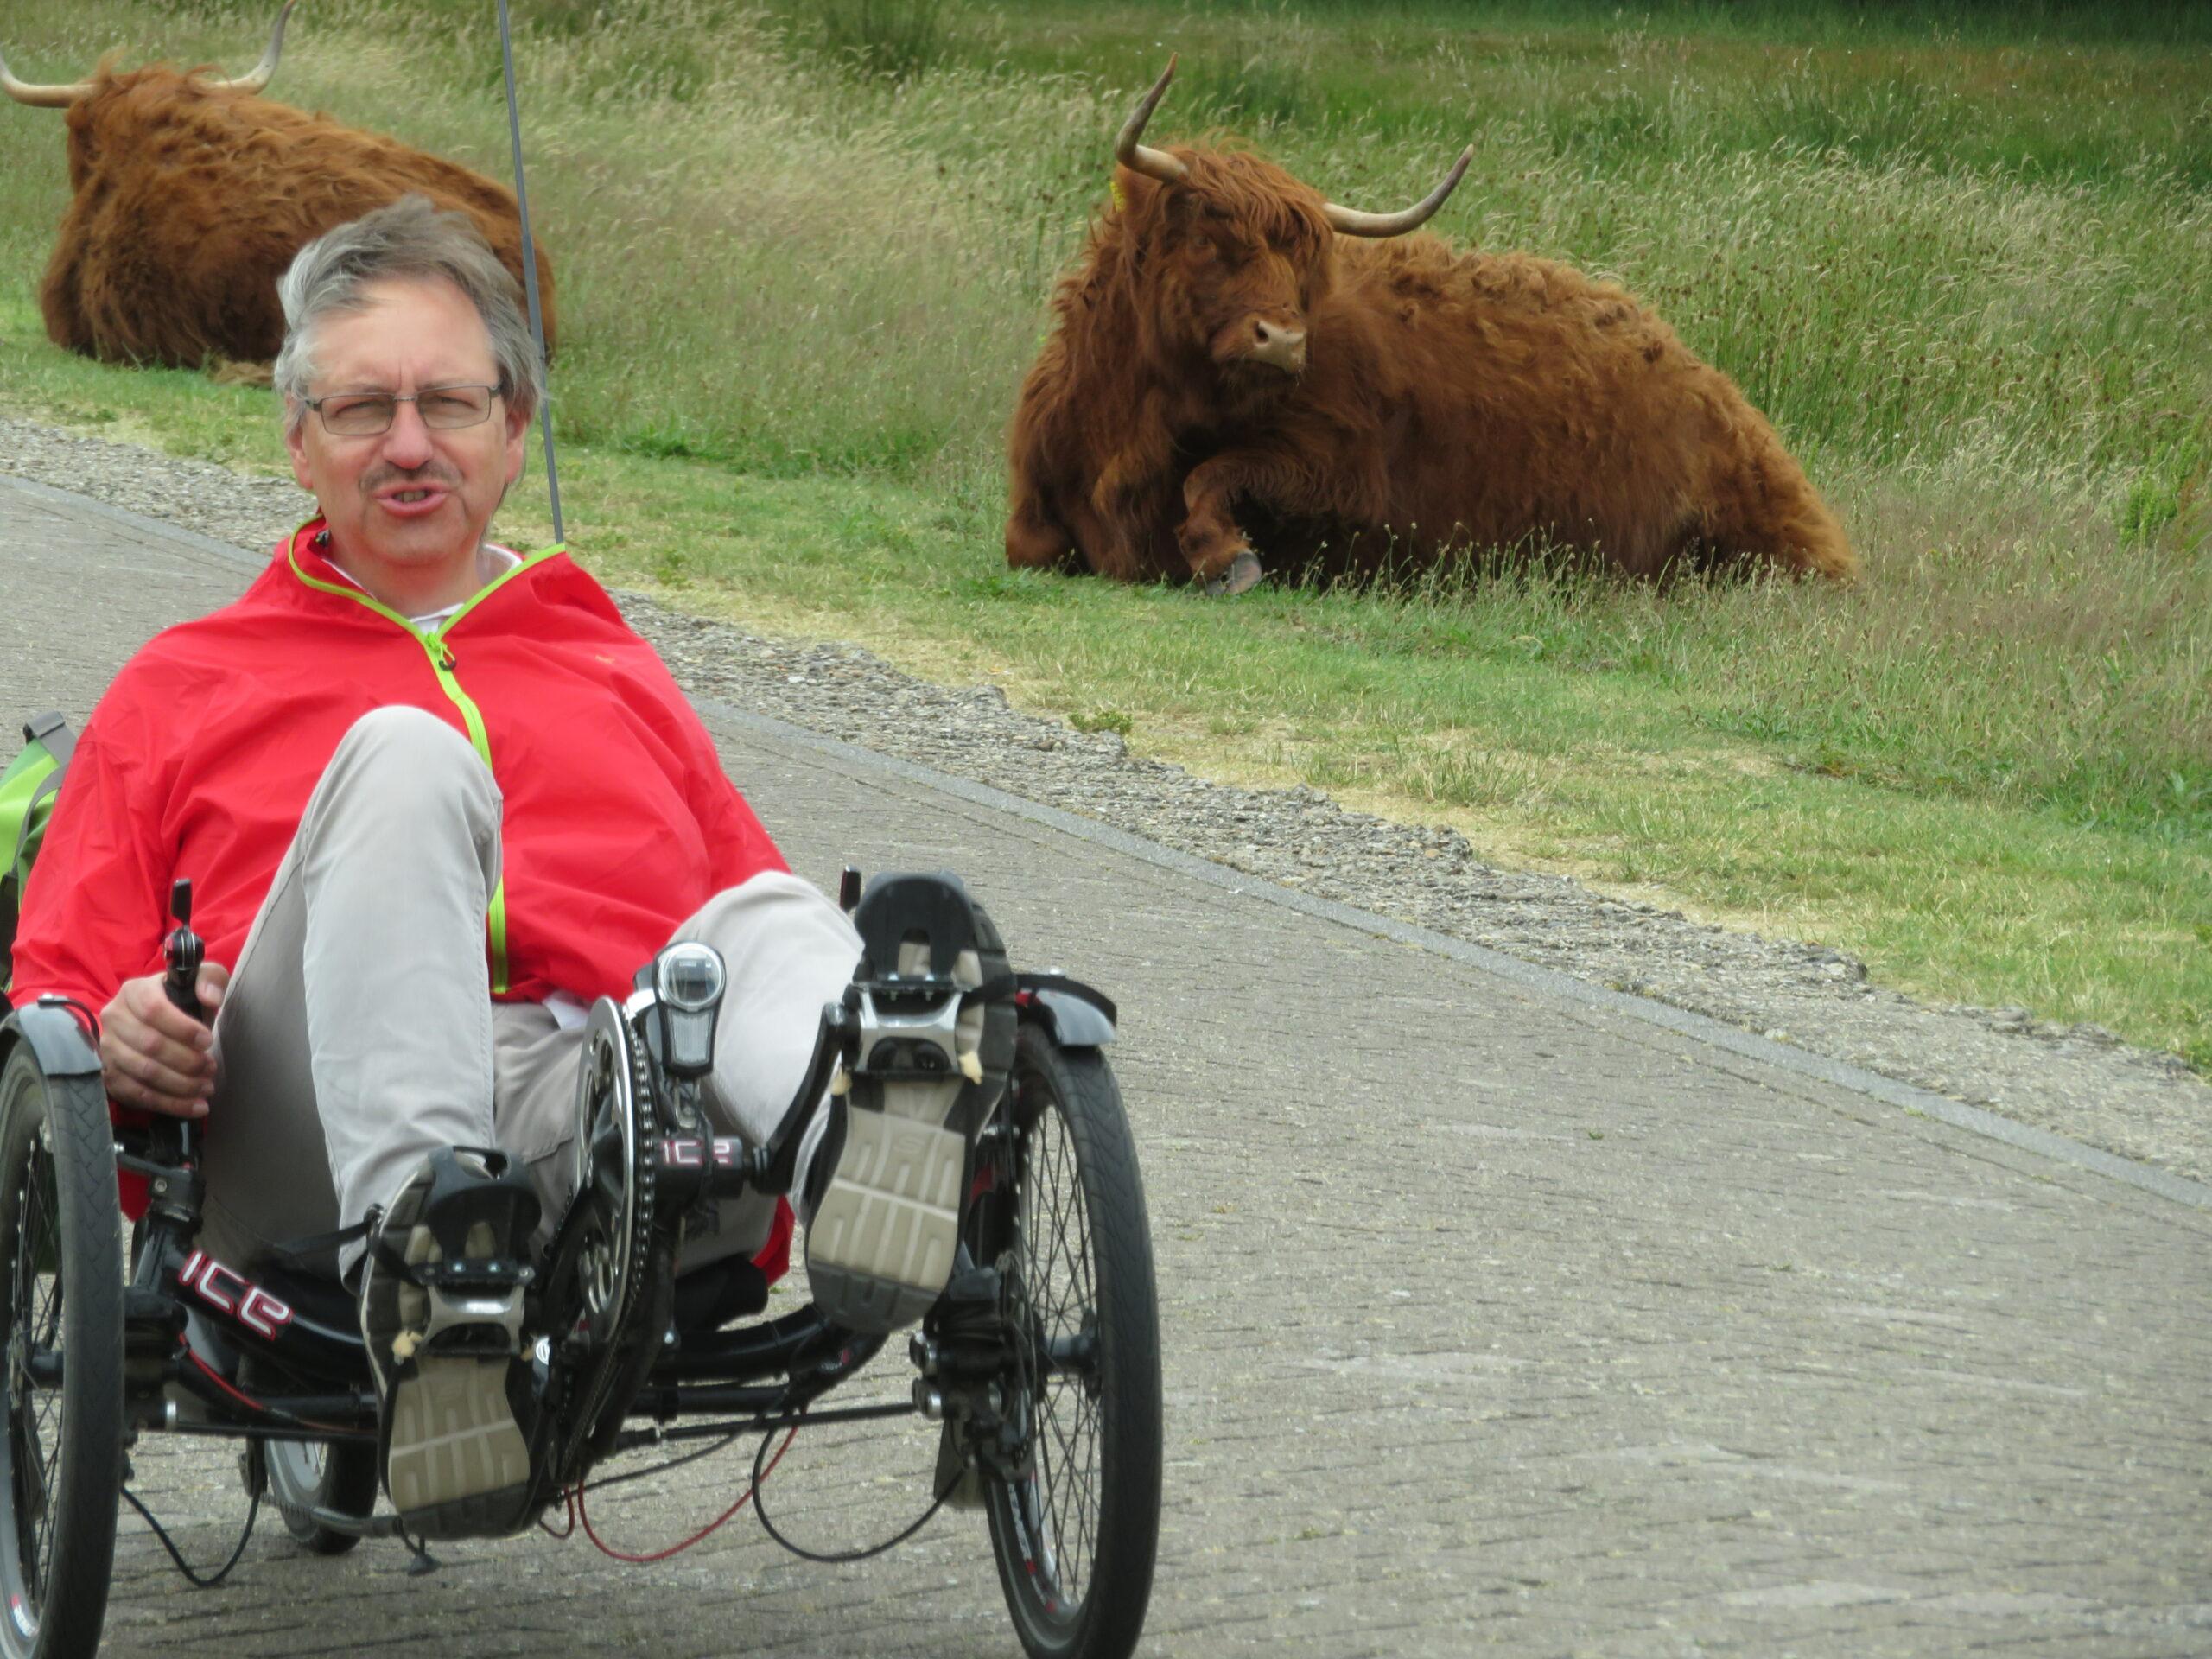 Foto Doktor Andreas Bach auf seinem Liegenrad